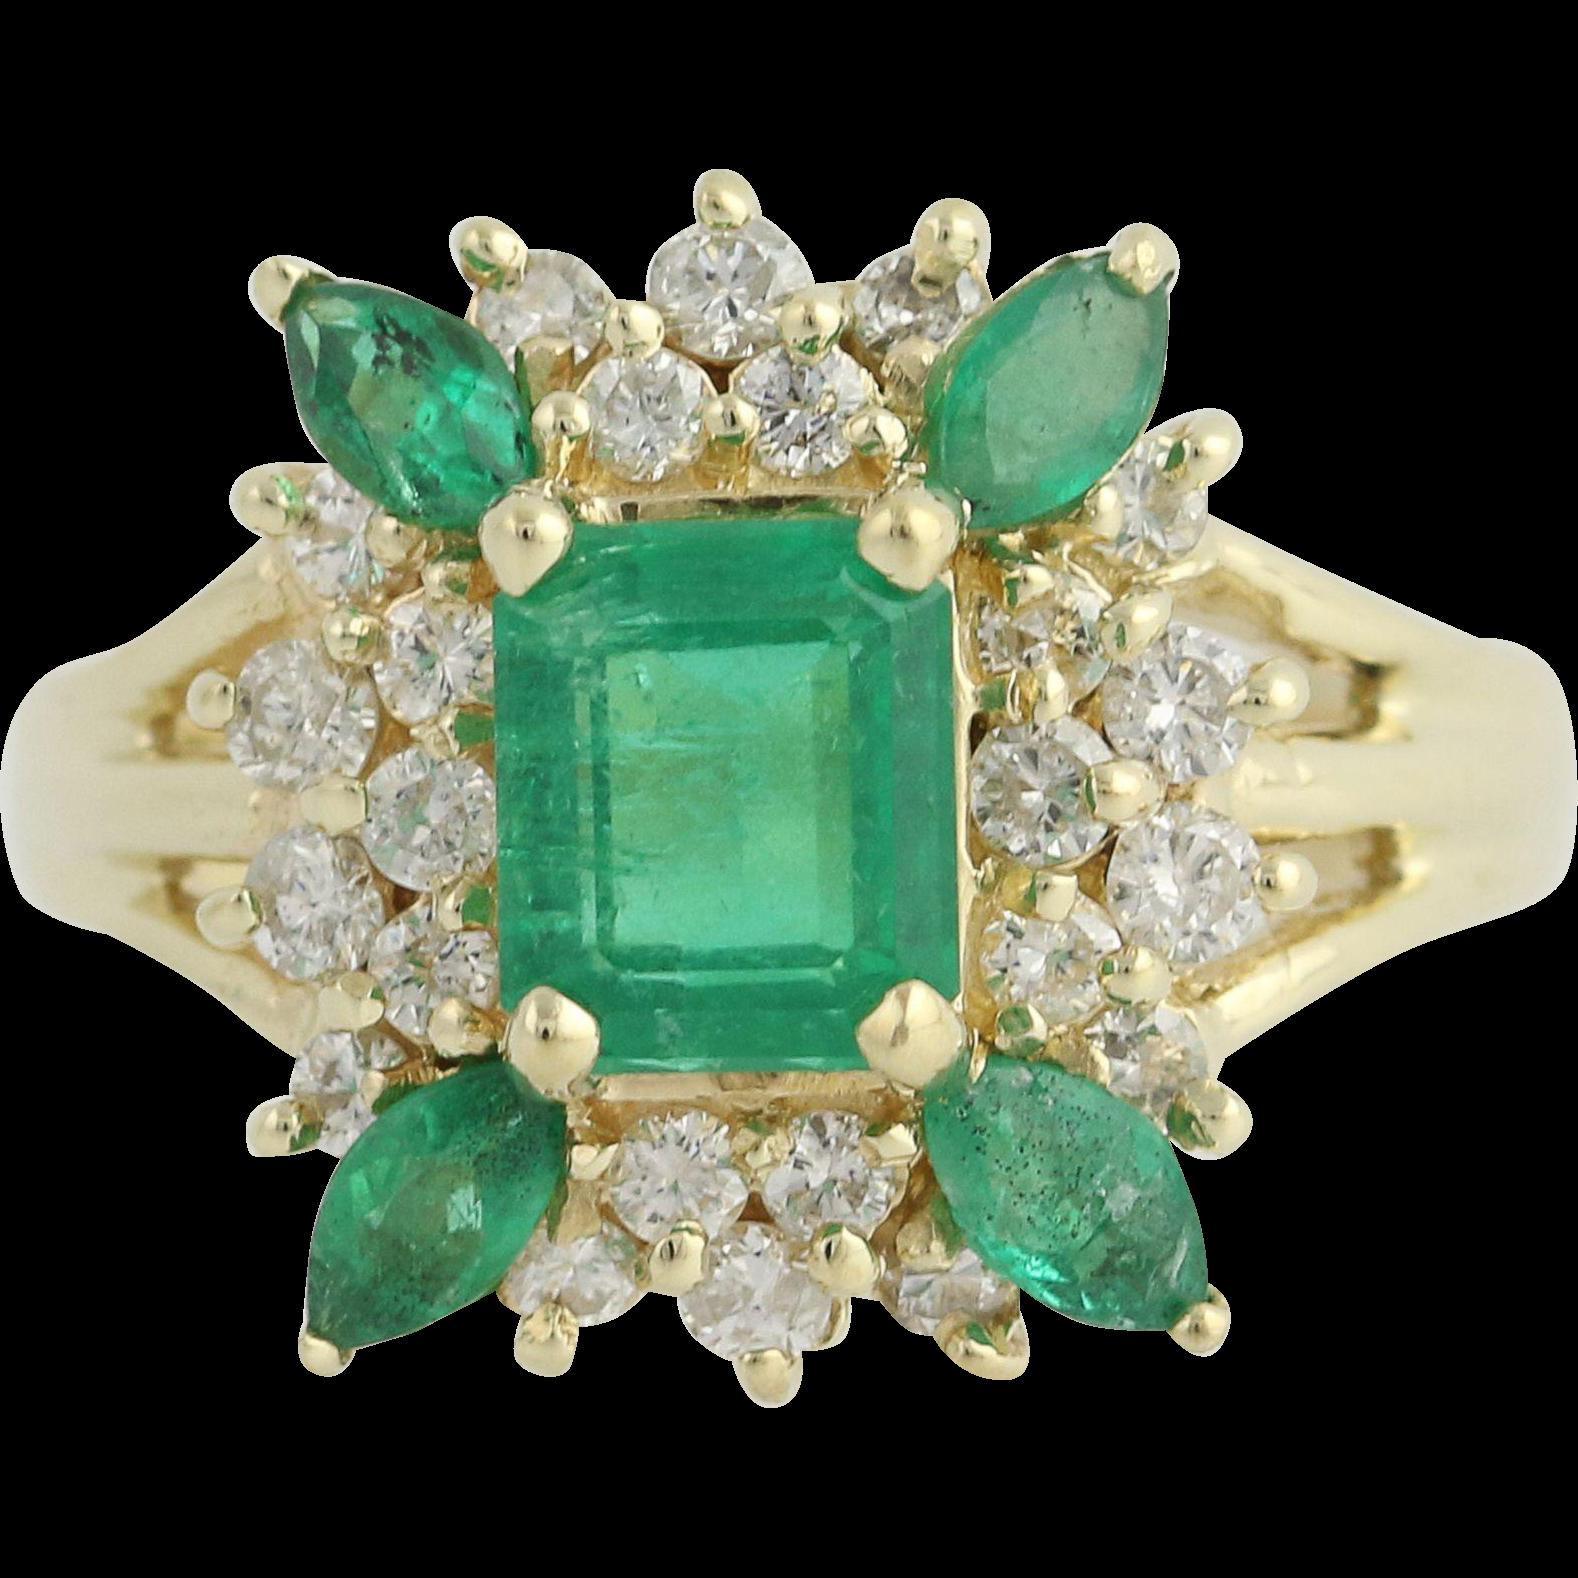 Emerald & Diamond Ring - 14k Yellow Gold May Birthstone 2.15ctw